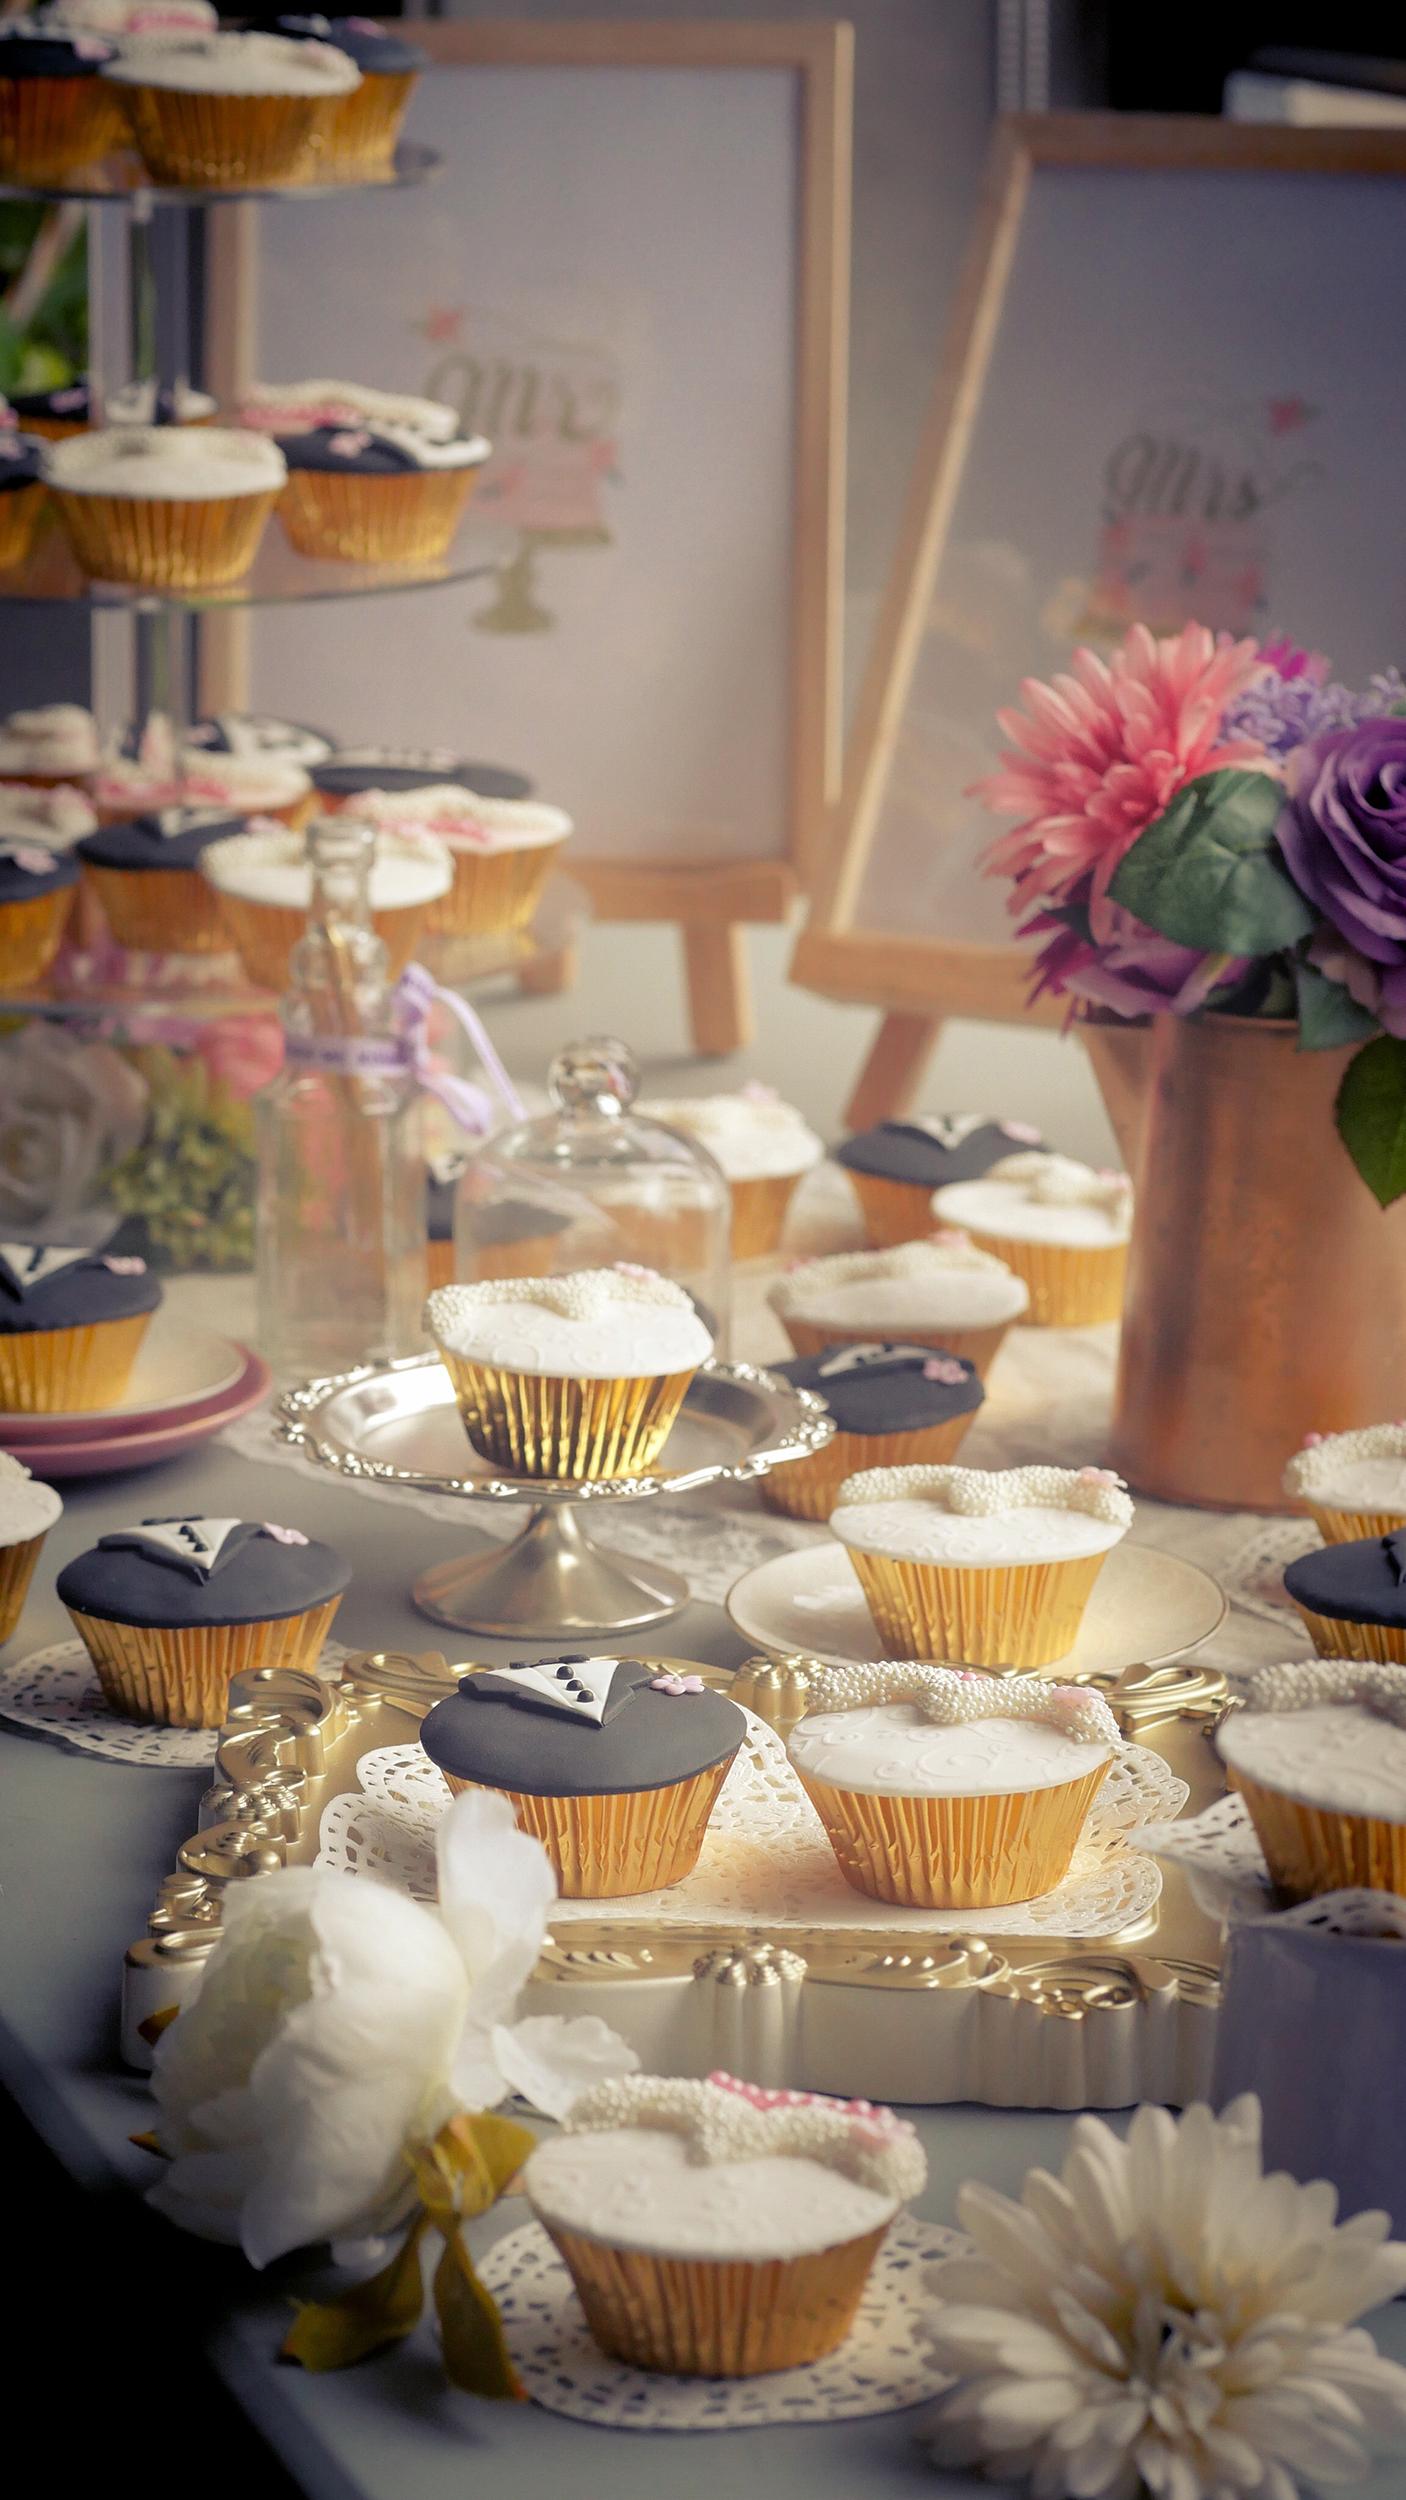 us_cupcakes (2)